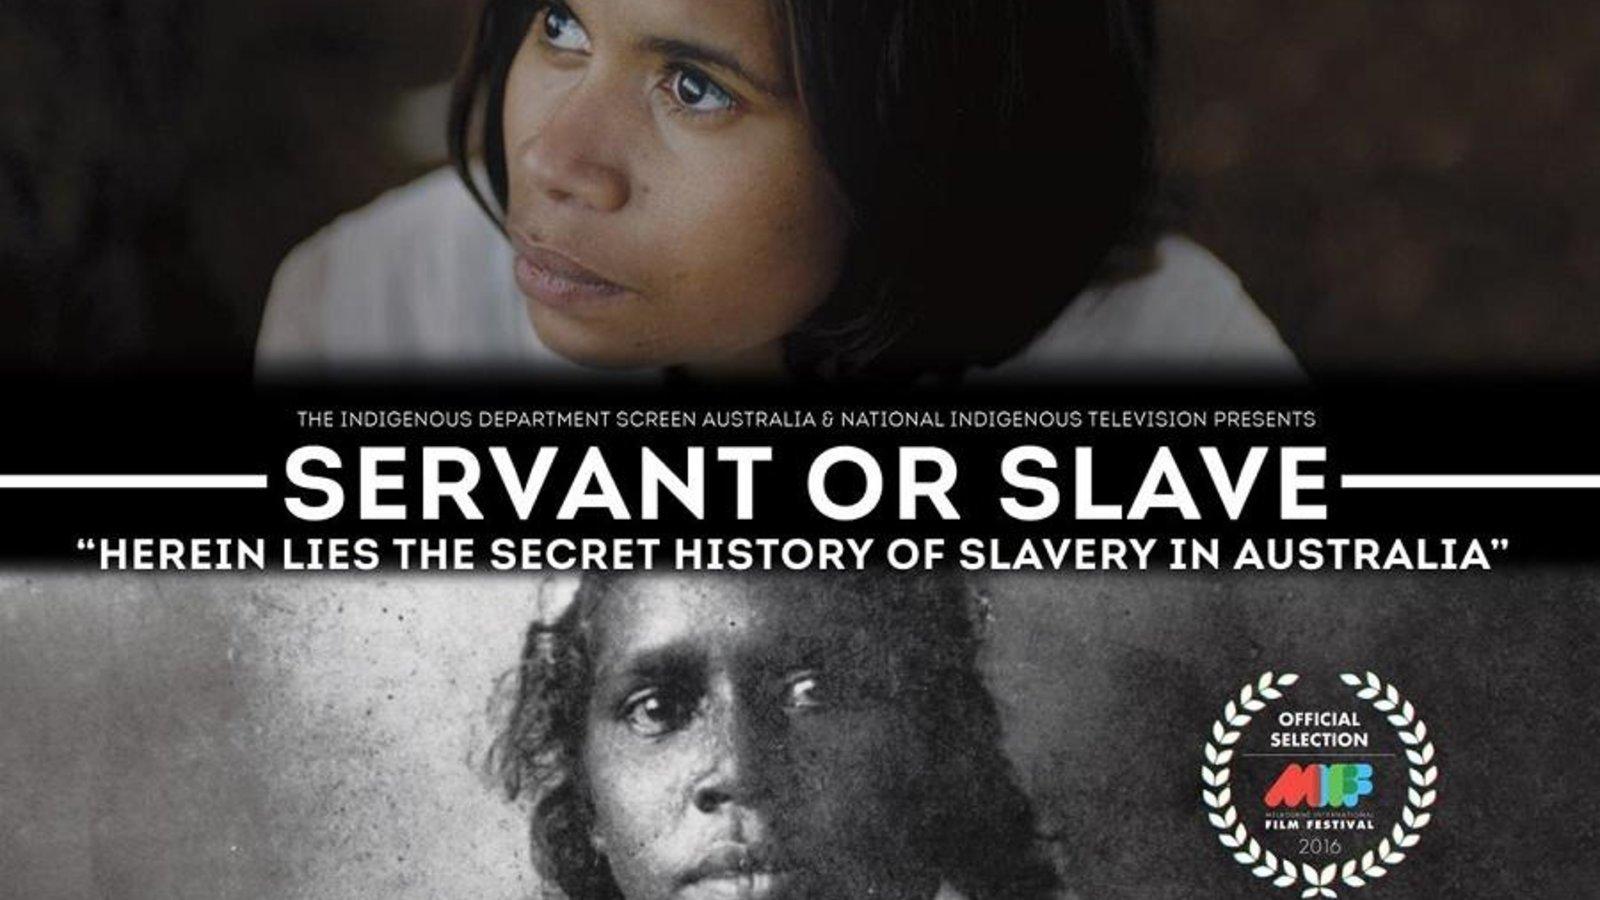 Servant or Slave - The Secret History of Slavery in Australia